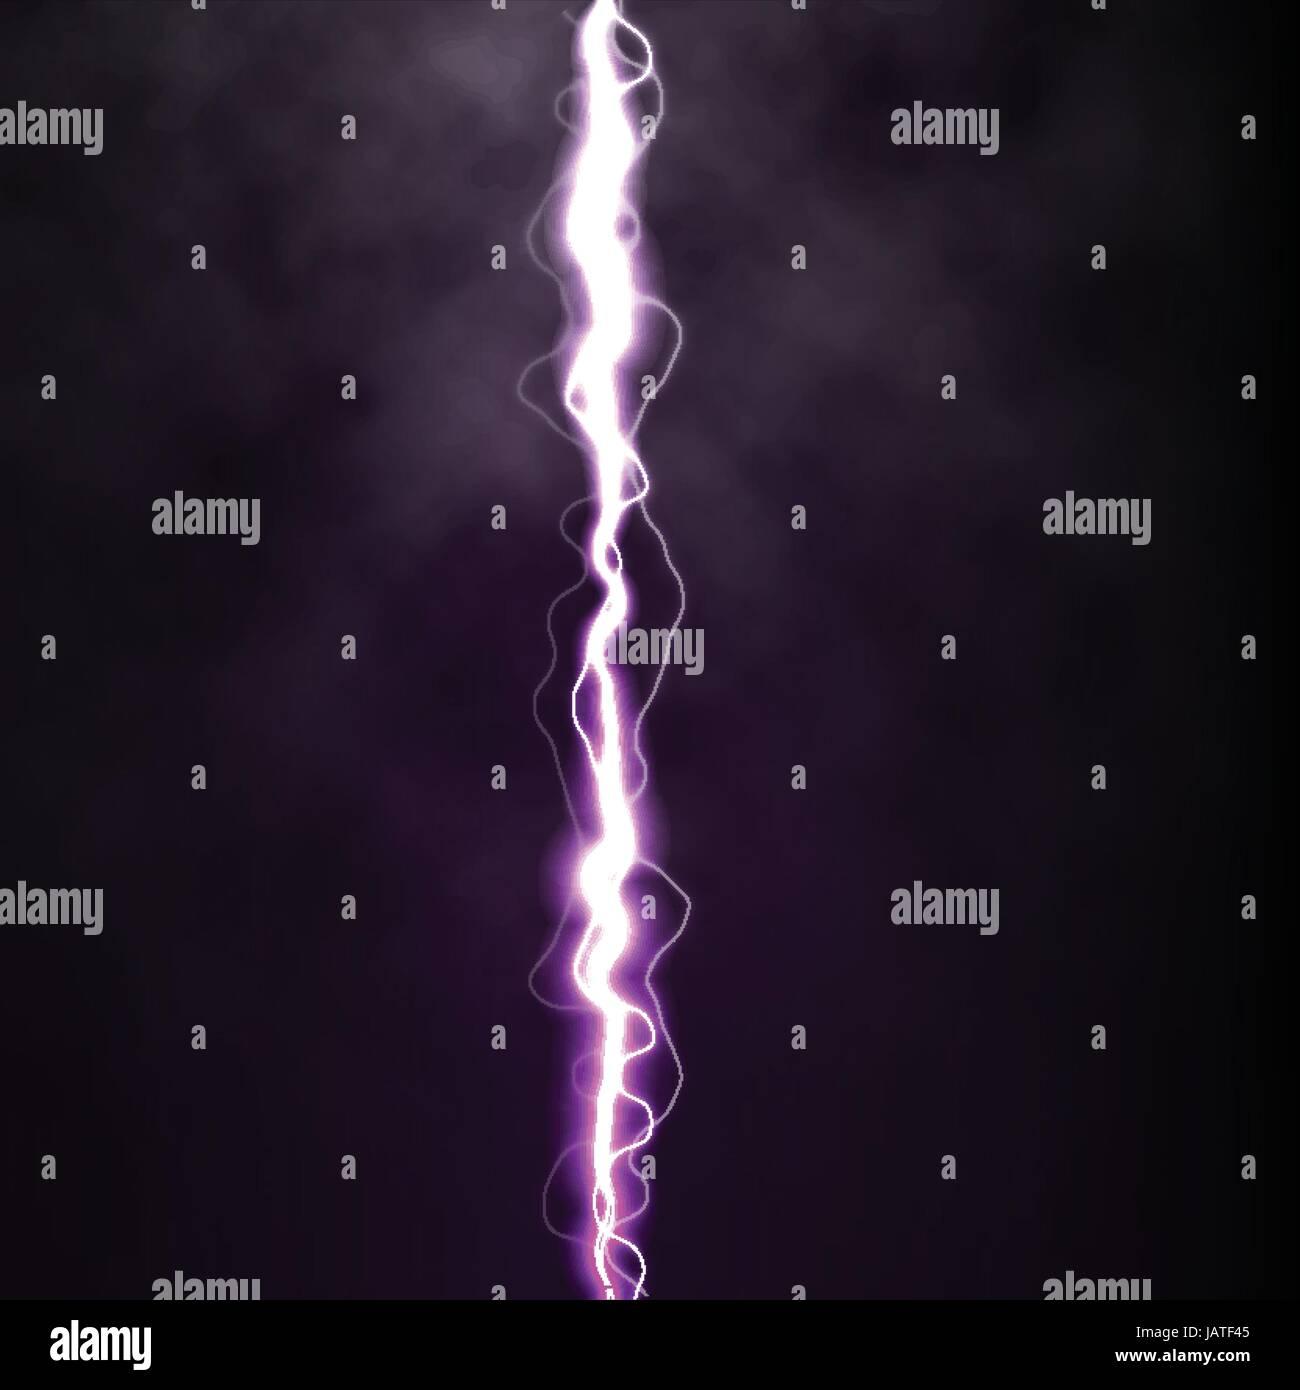 Lightning Flash Light Thunder Spark On Black Background With Clouds Stock Vector Image Art Alamy